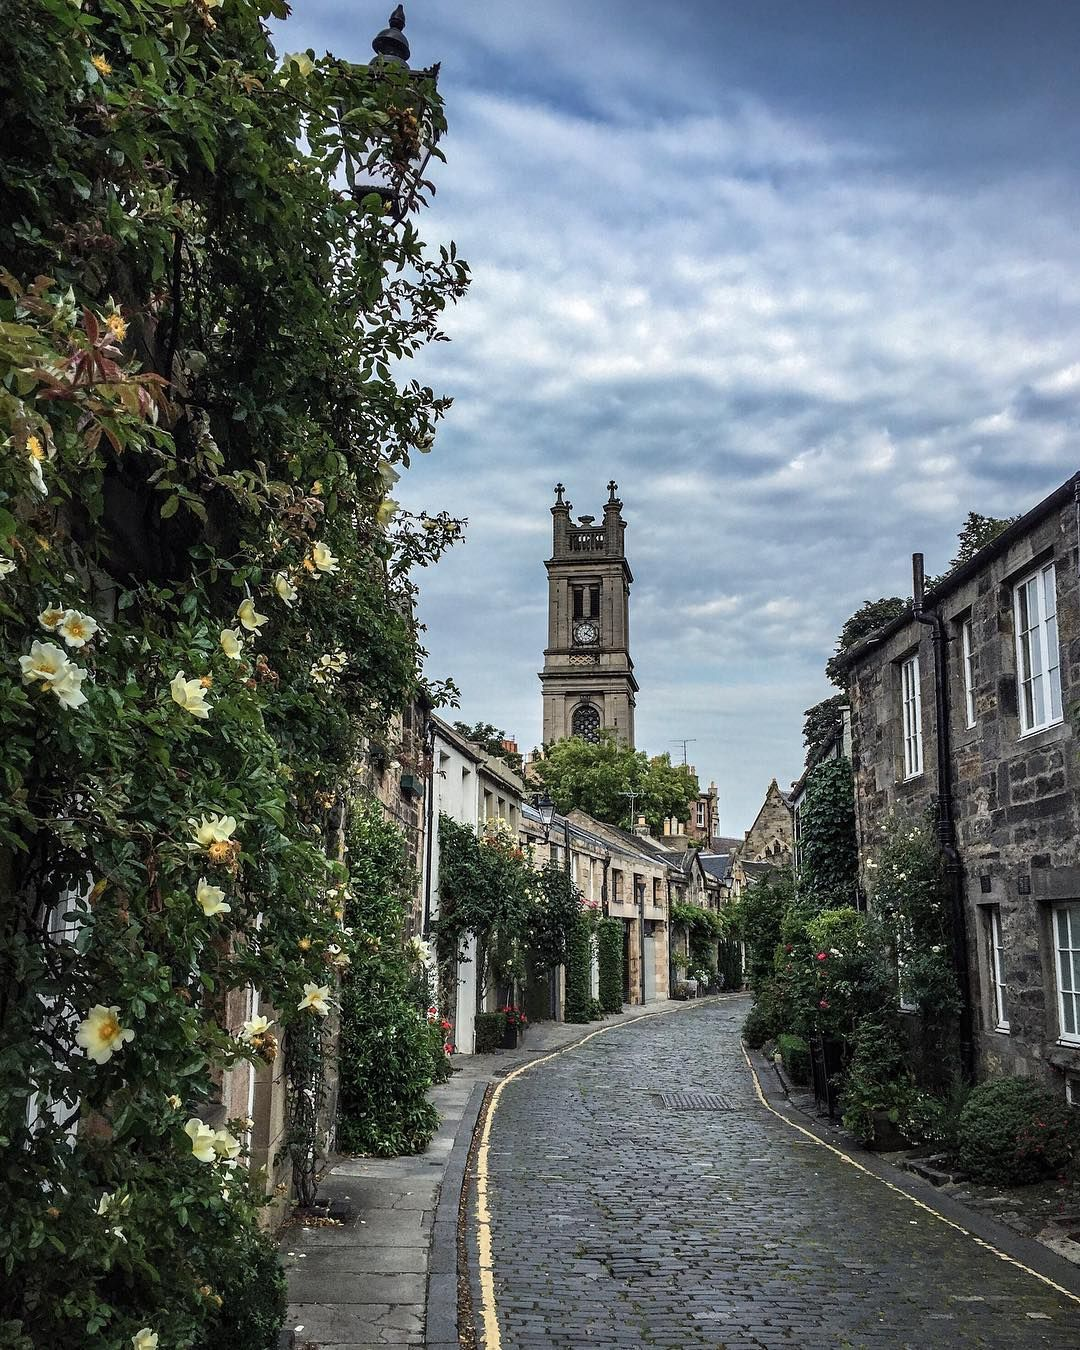 Circus Lane, Edinburgh #circuslane #edinburgh #myedinburgh #loveedinburgh #thisisedinburgh #visitscotland #edinburghhighlights…